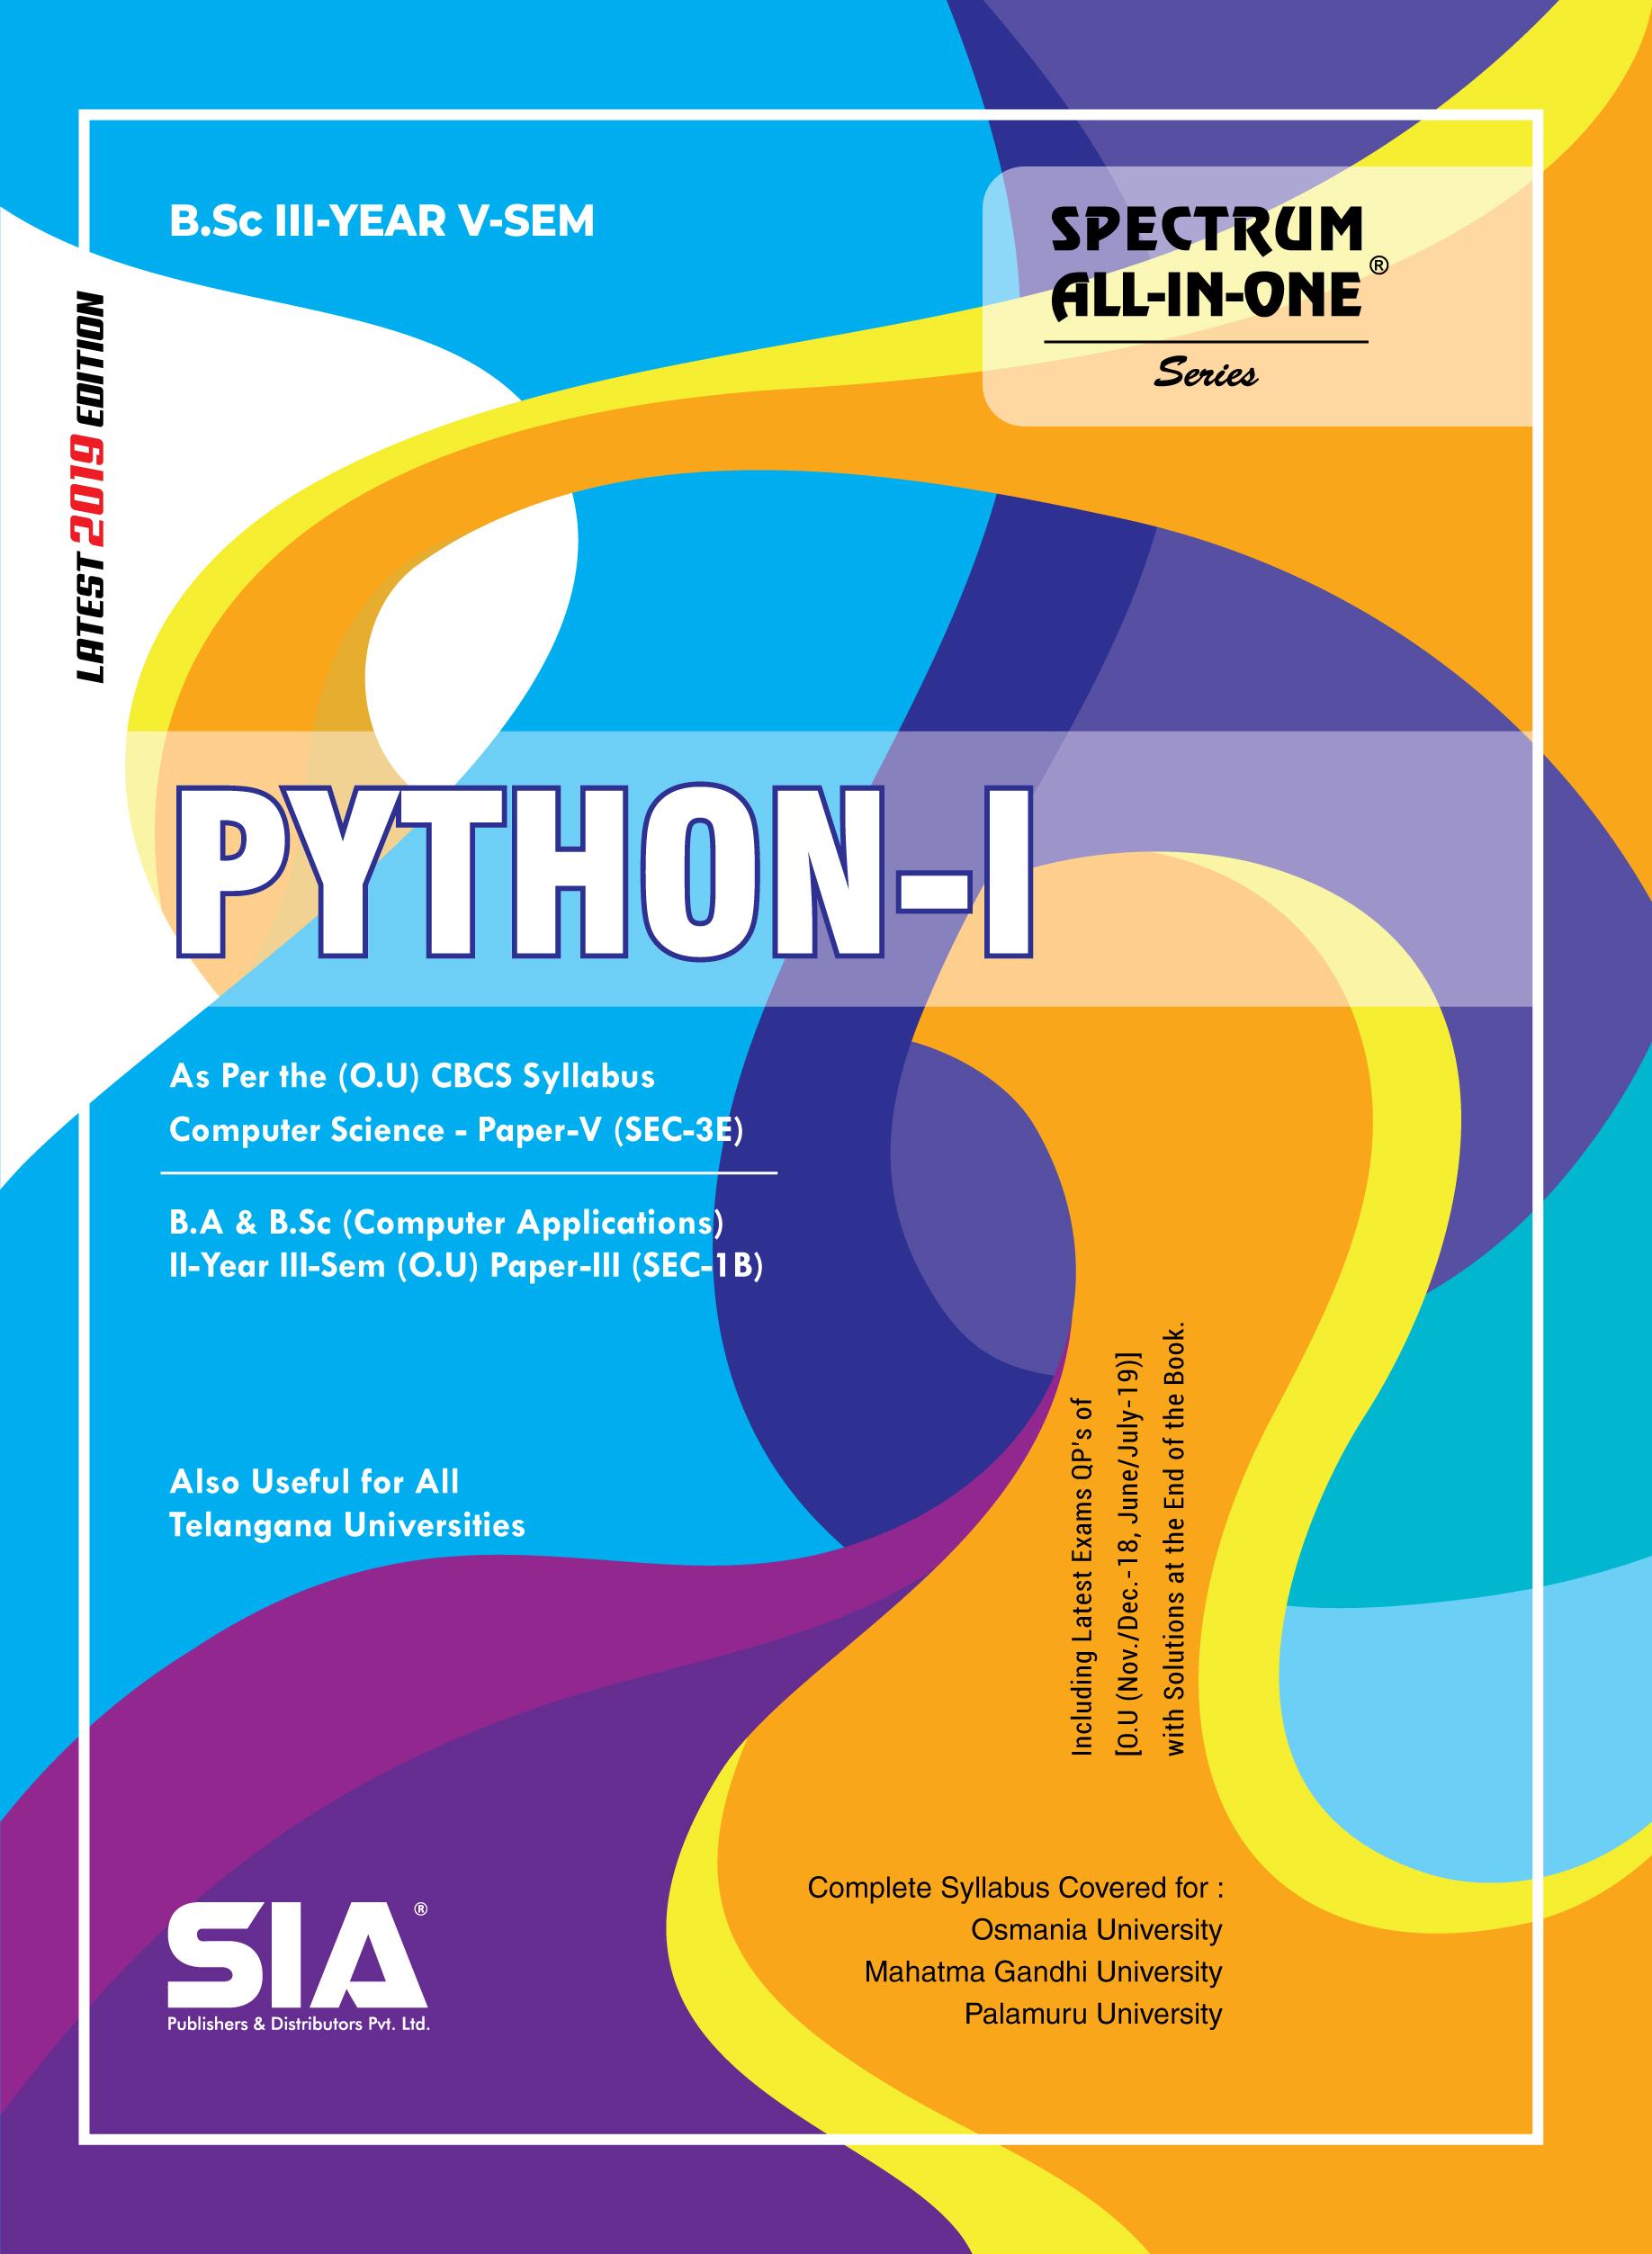 SIA Publishers arts-and-science-bsc-osmania-university-IIIyear-Vsem